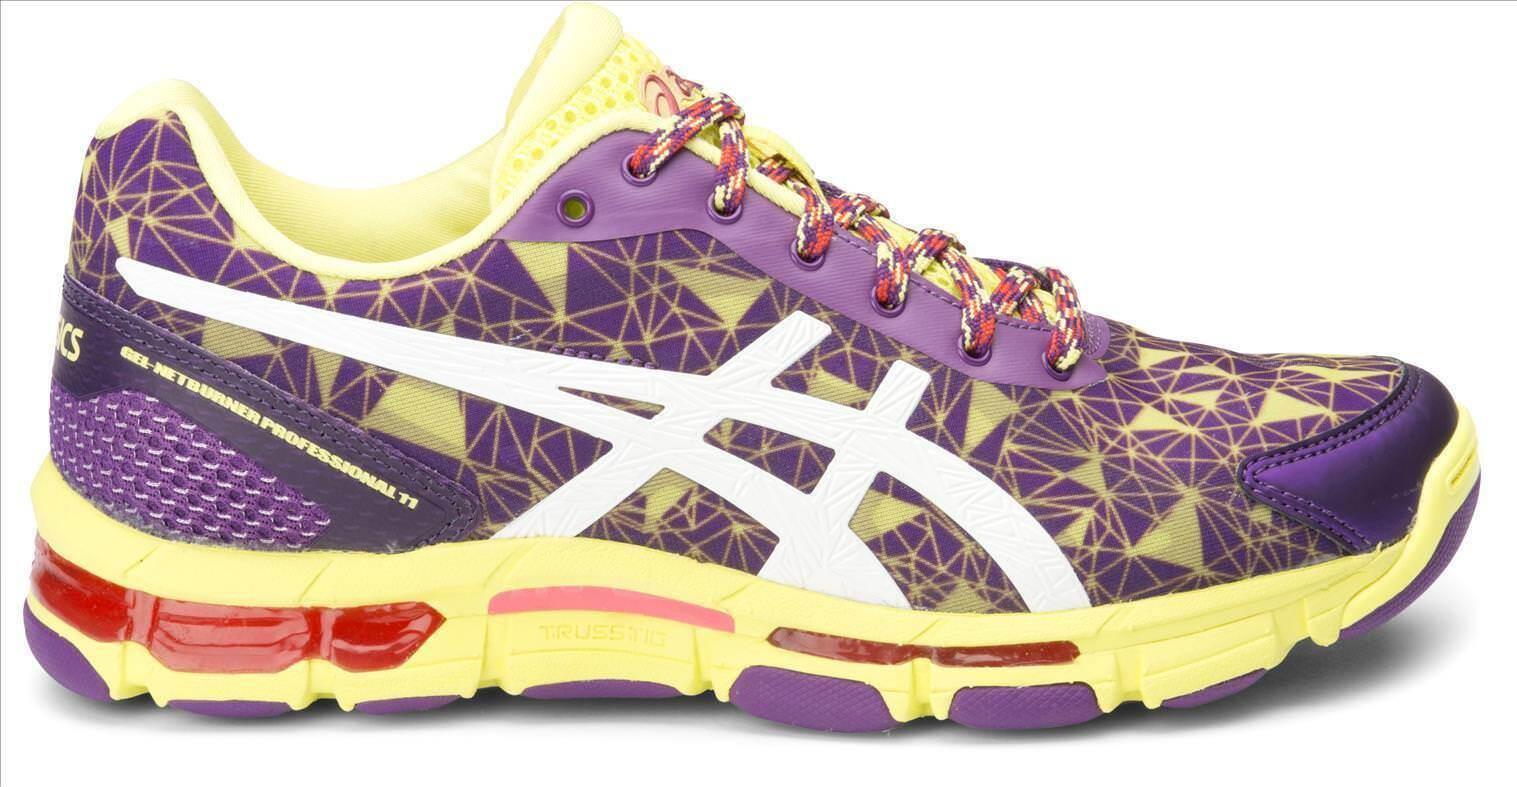 SPECIAL Asics     Asics SPECIAL Gel Netburner Professional 11 Donna Netball Shoes (B) (6038) 16271b